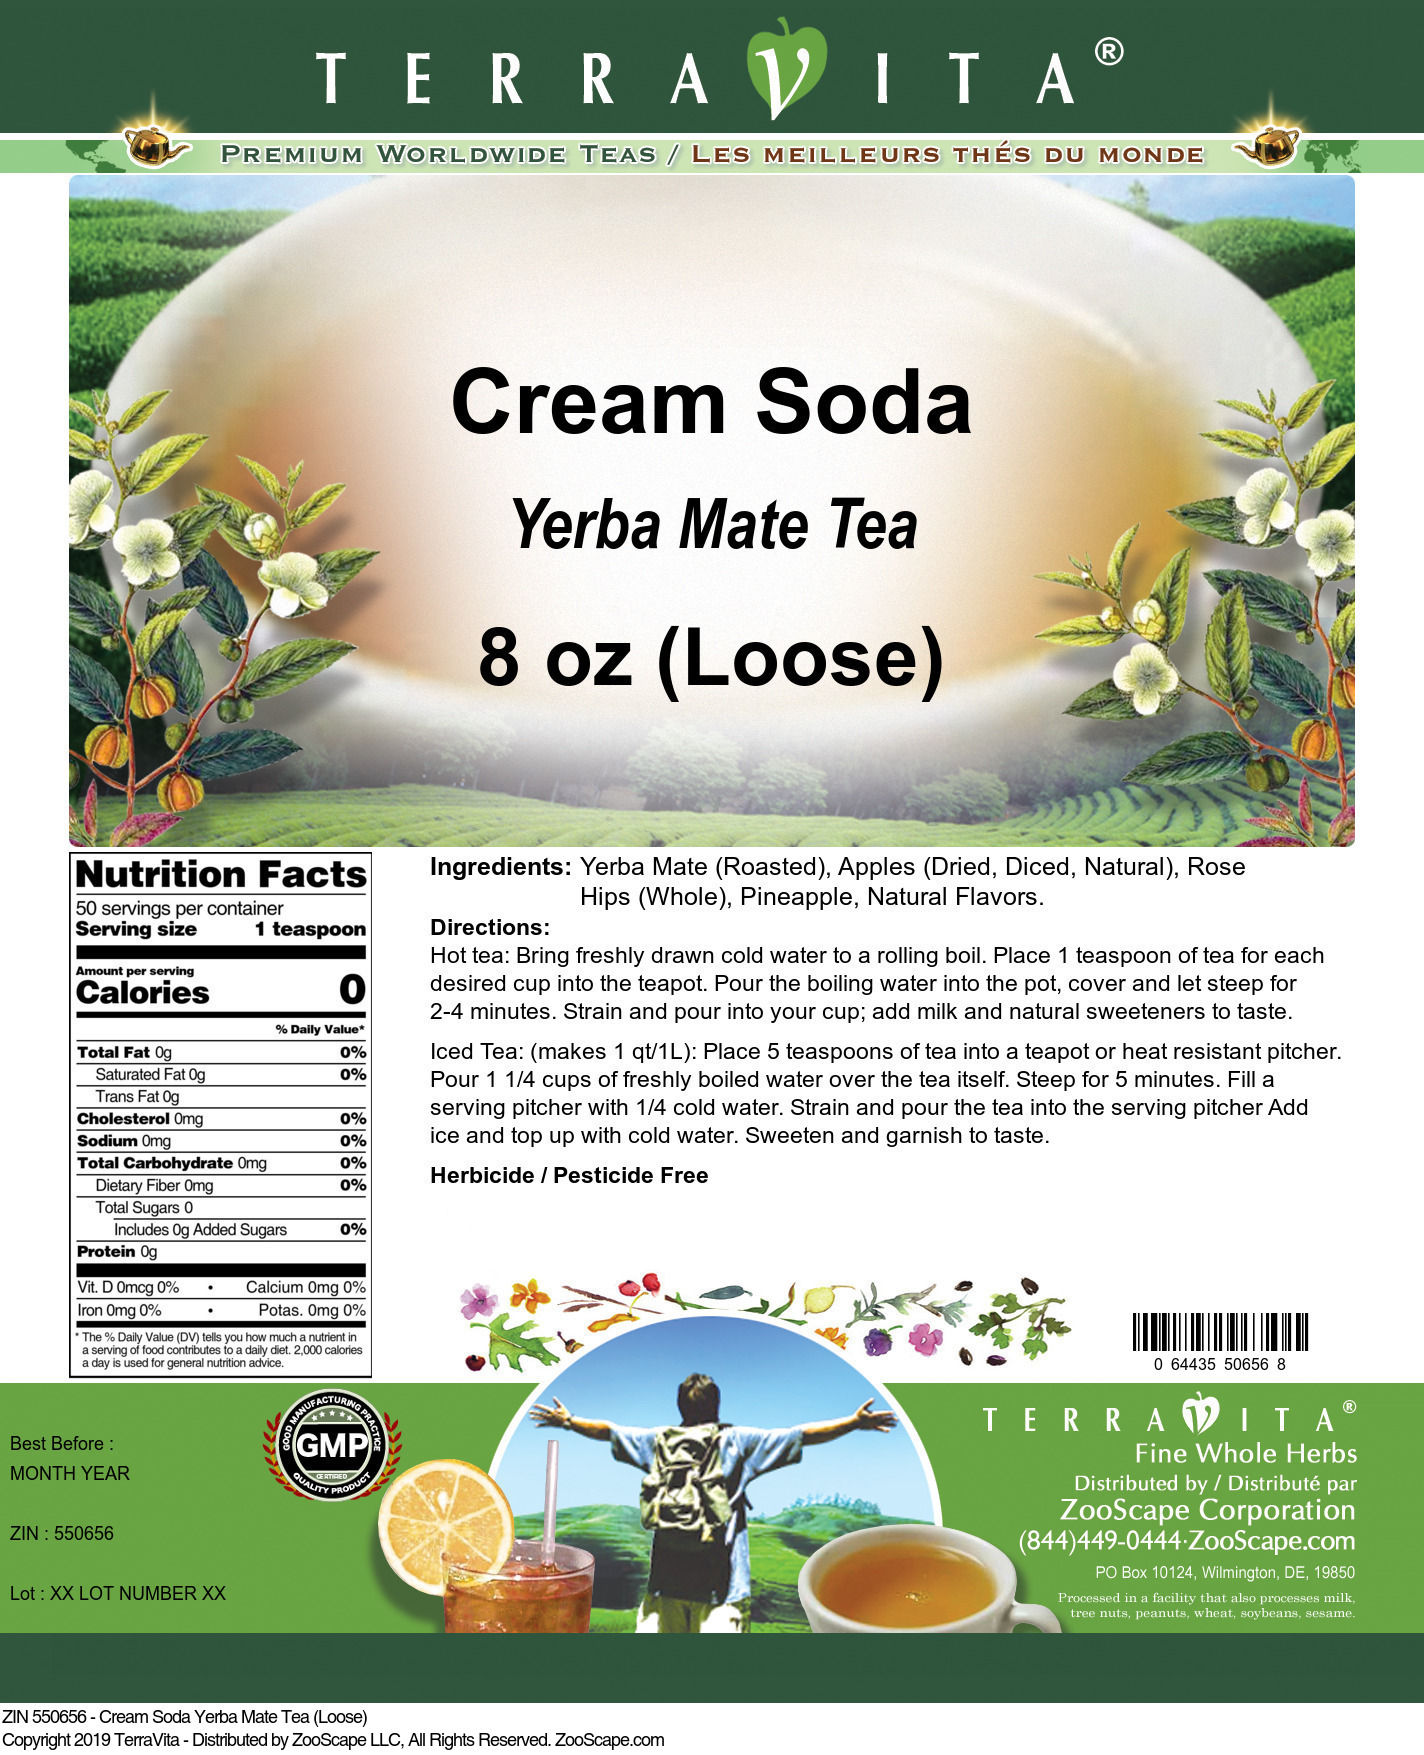 Cream Soda Yerba Mate